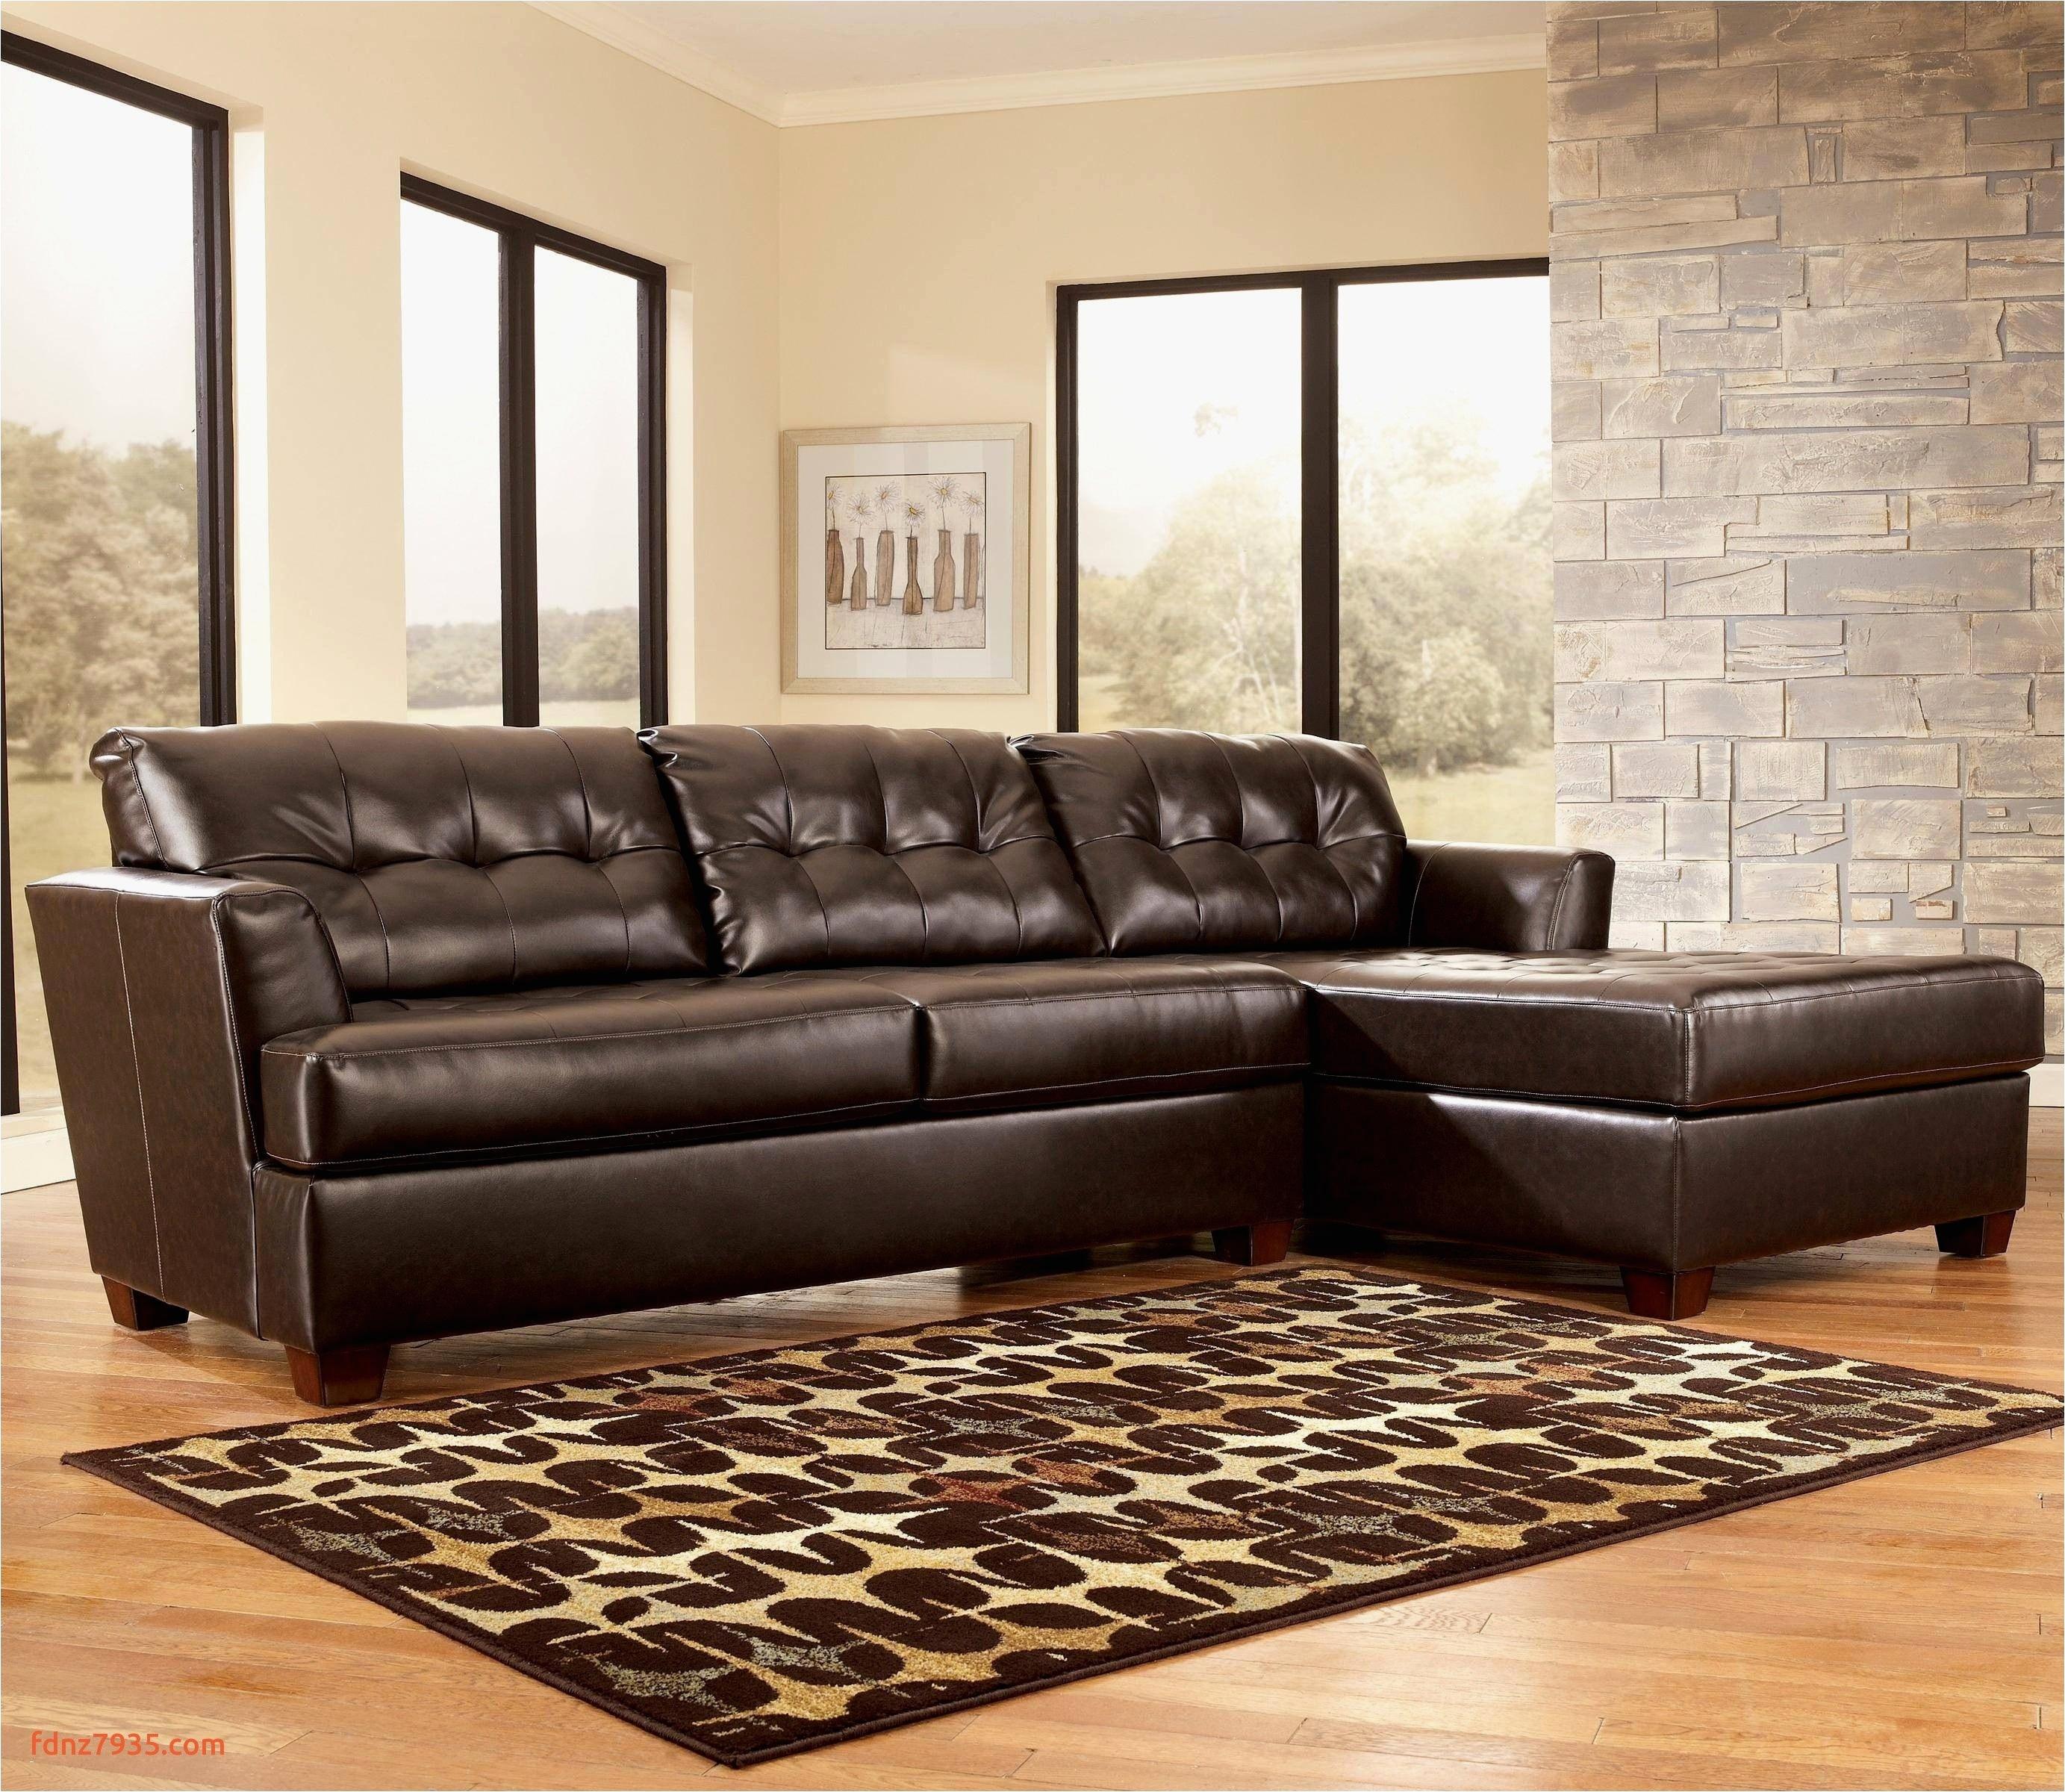 ashley furniture financing bad credit awesome ashley furniture white leather sofa fresh sofa design images